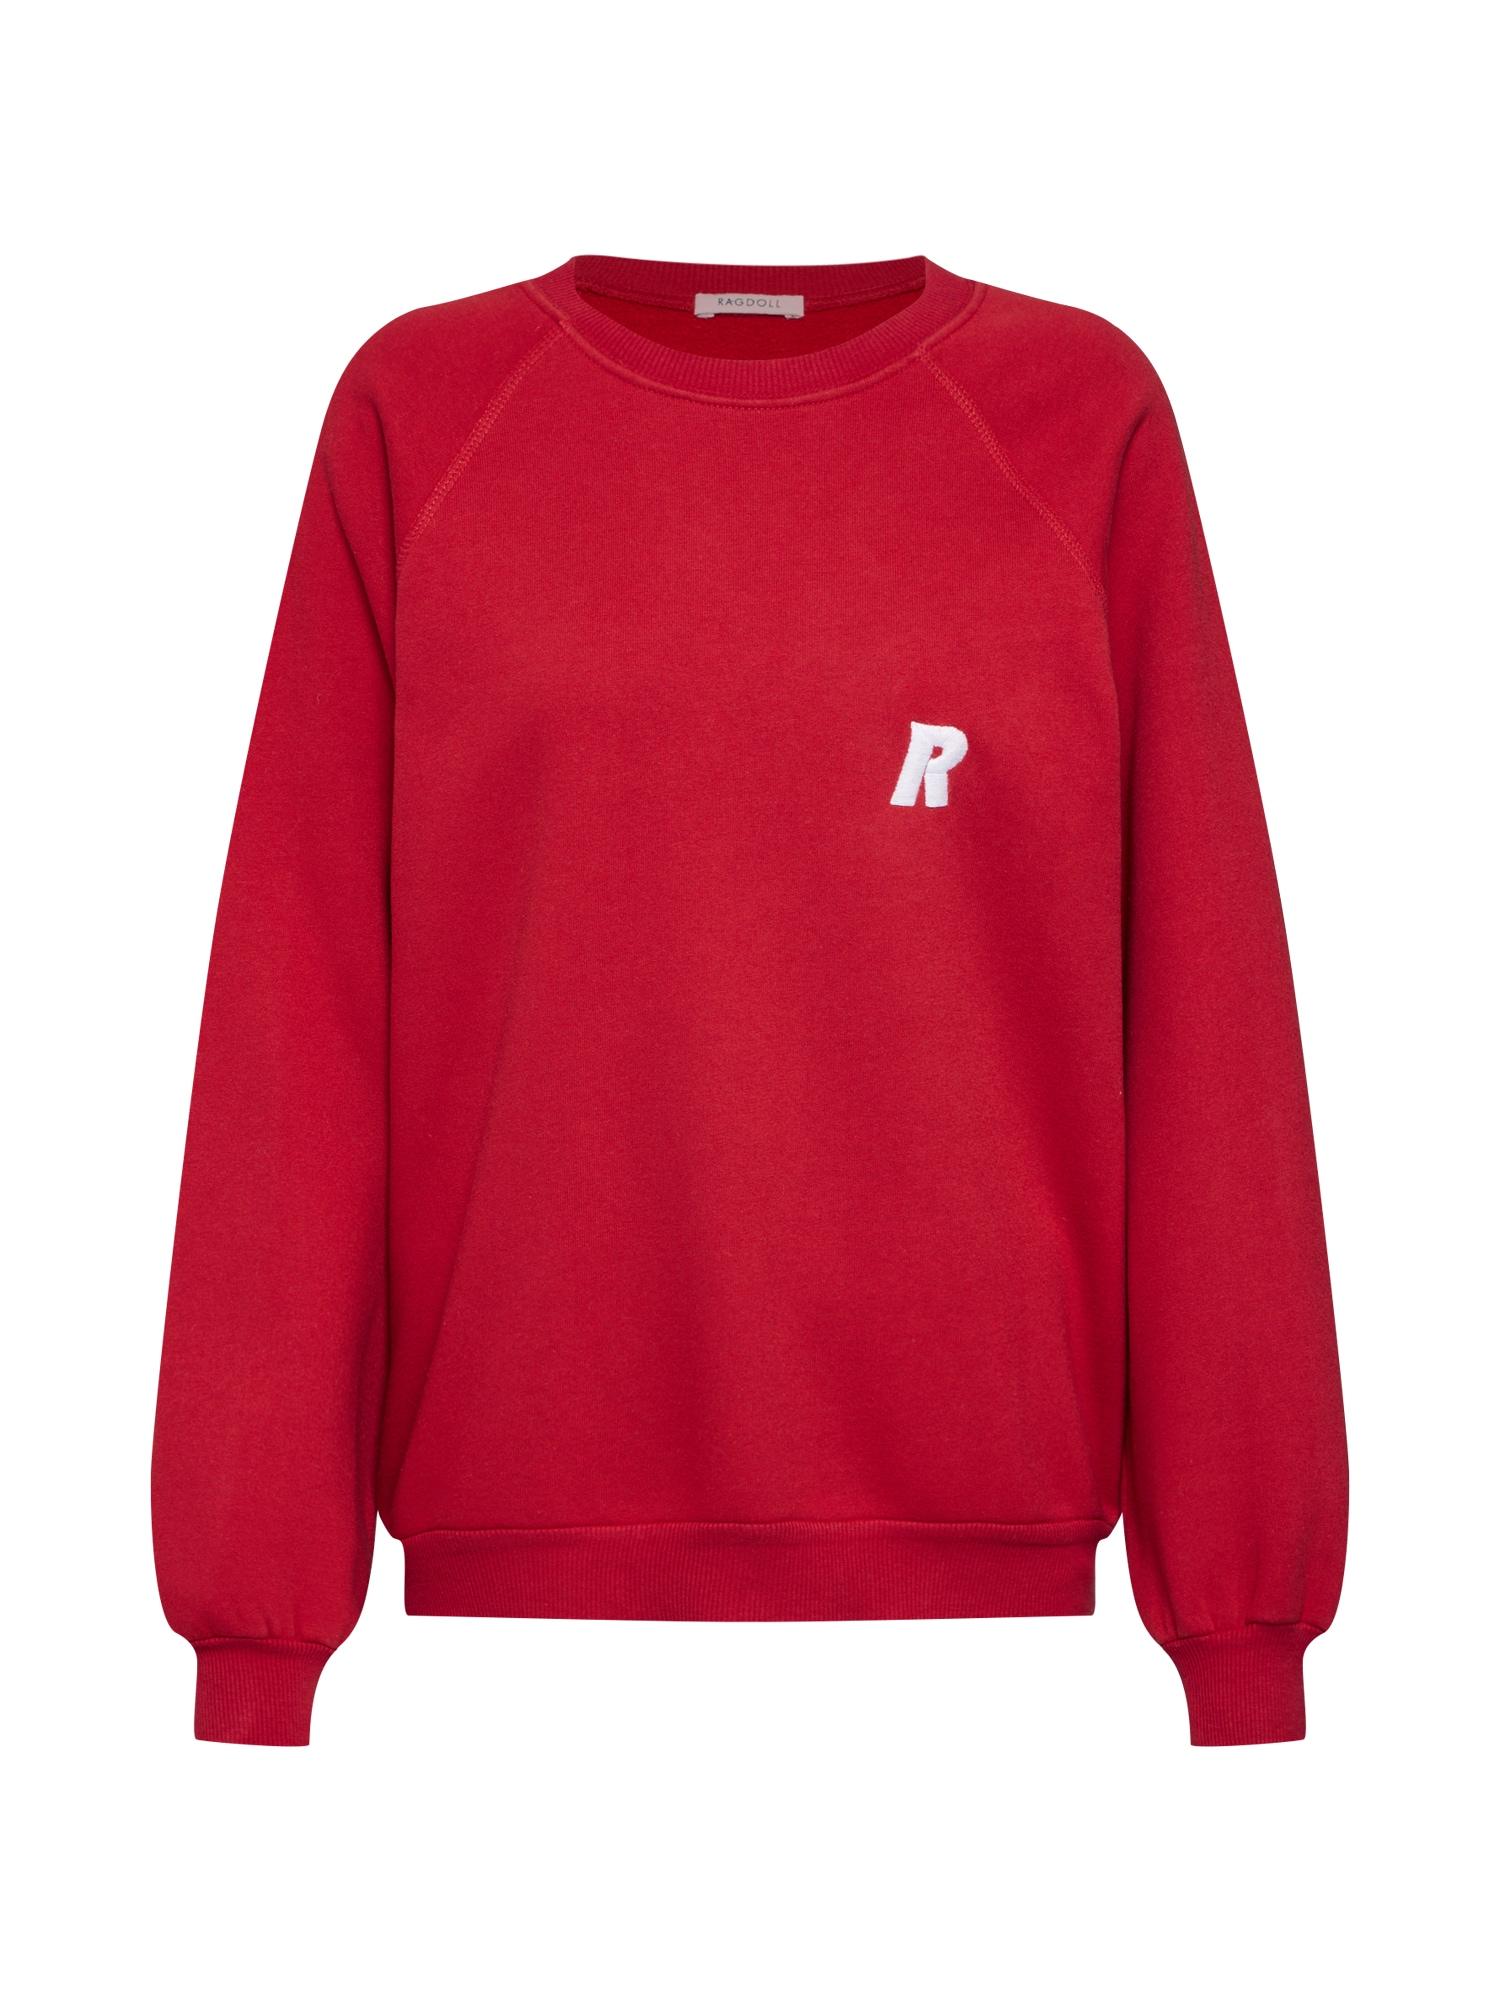 Mikina Oversized Sweatshirt červená Ragdoll LA